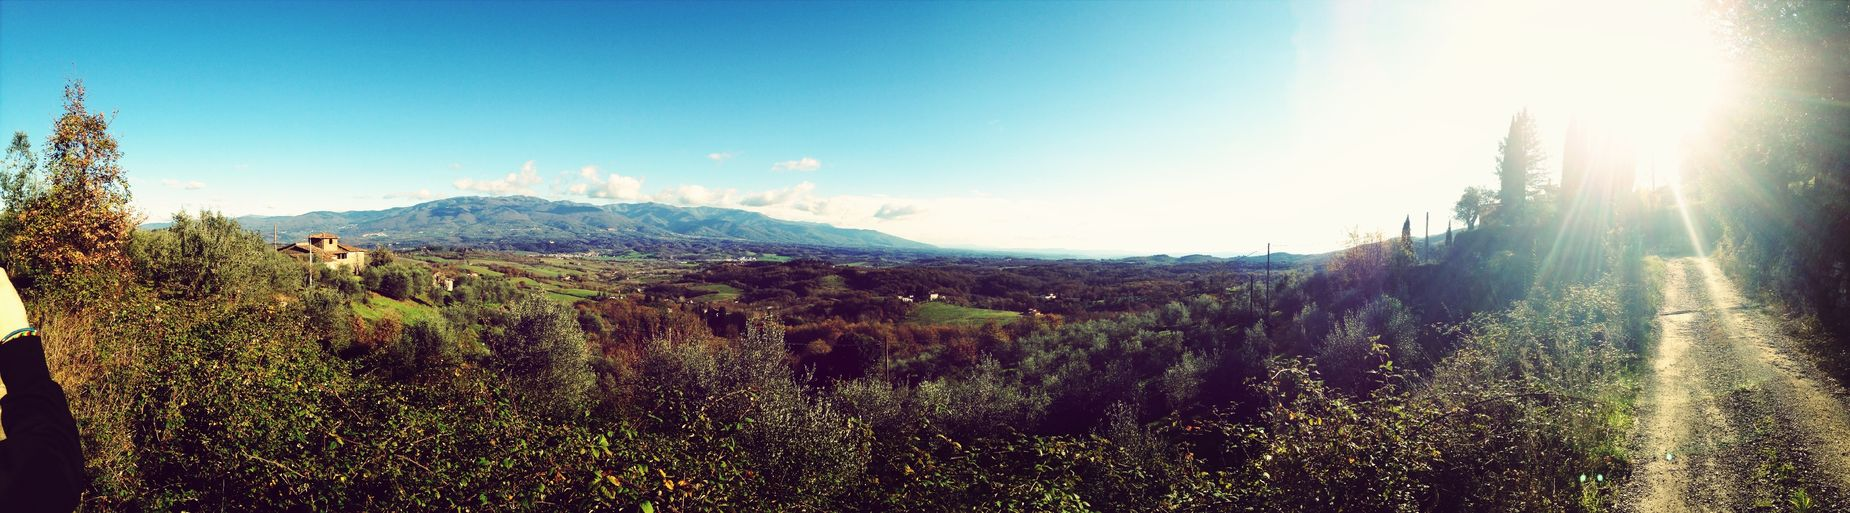 Photography Taking Photos Panorama Valdarno Toscana Sunny Day Sunny☀ Beautiful Day Beautiful Nature